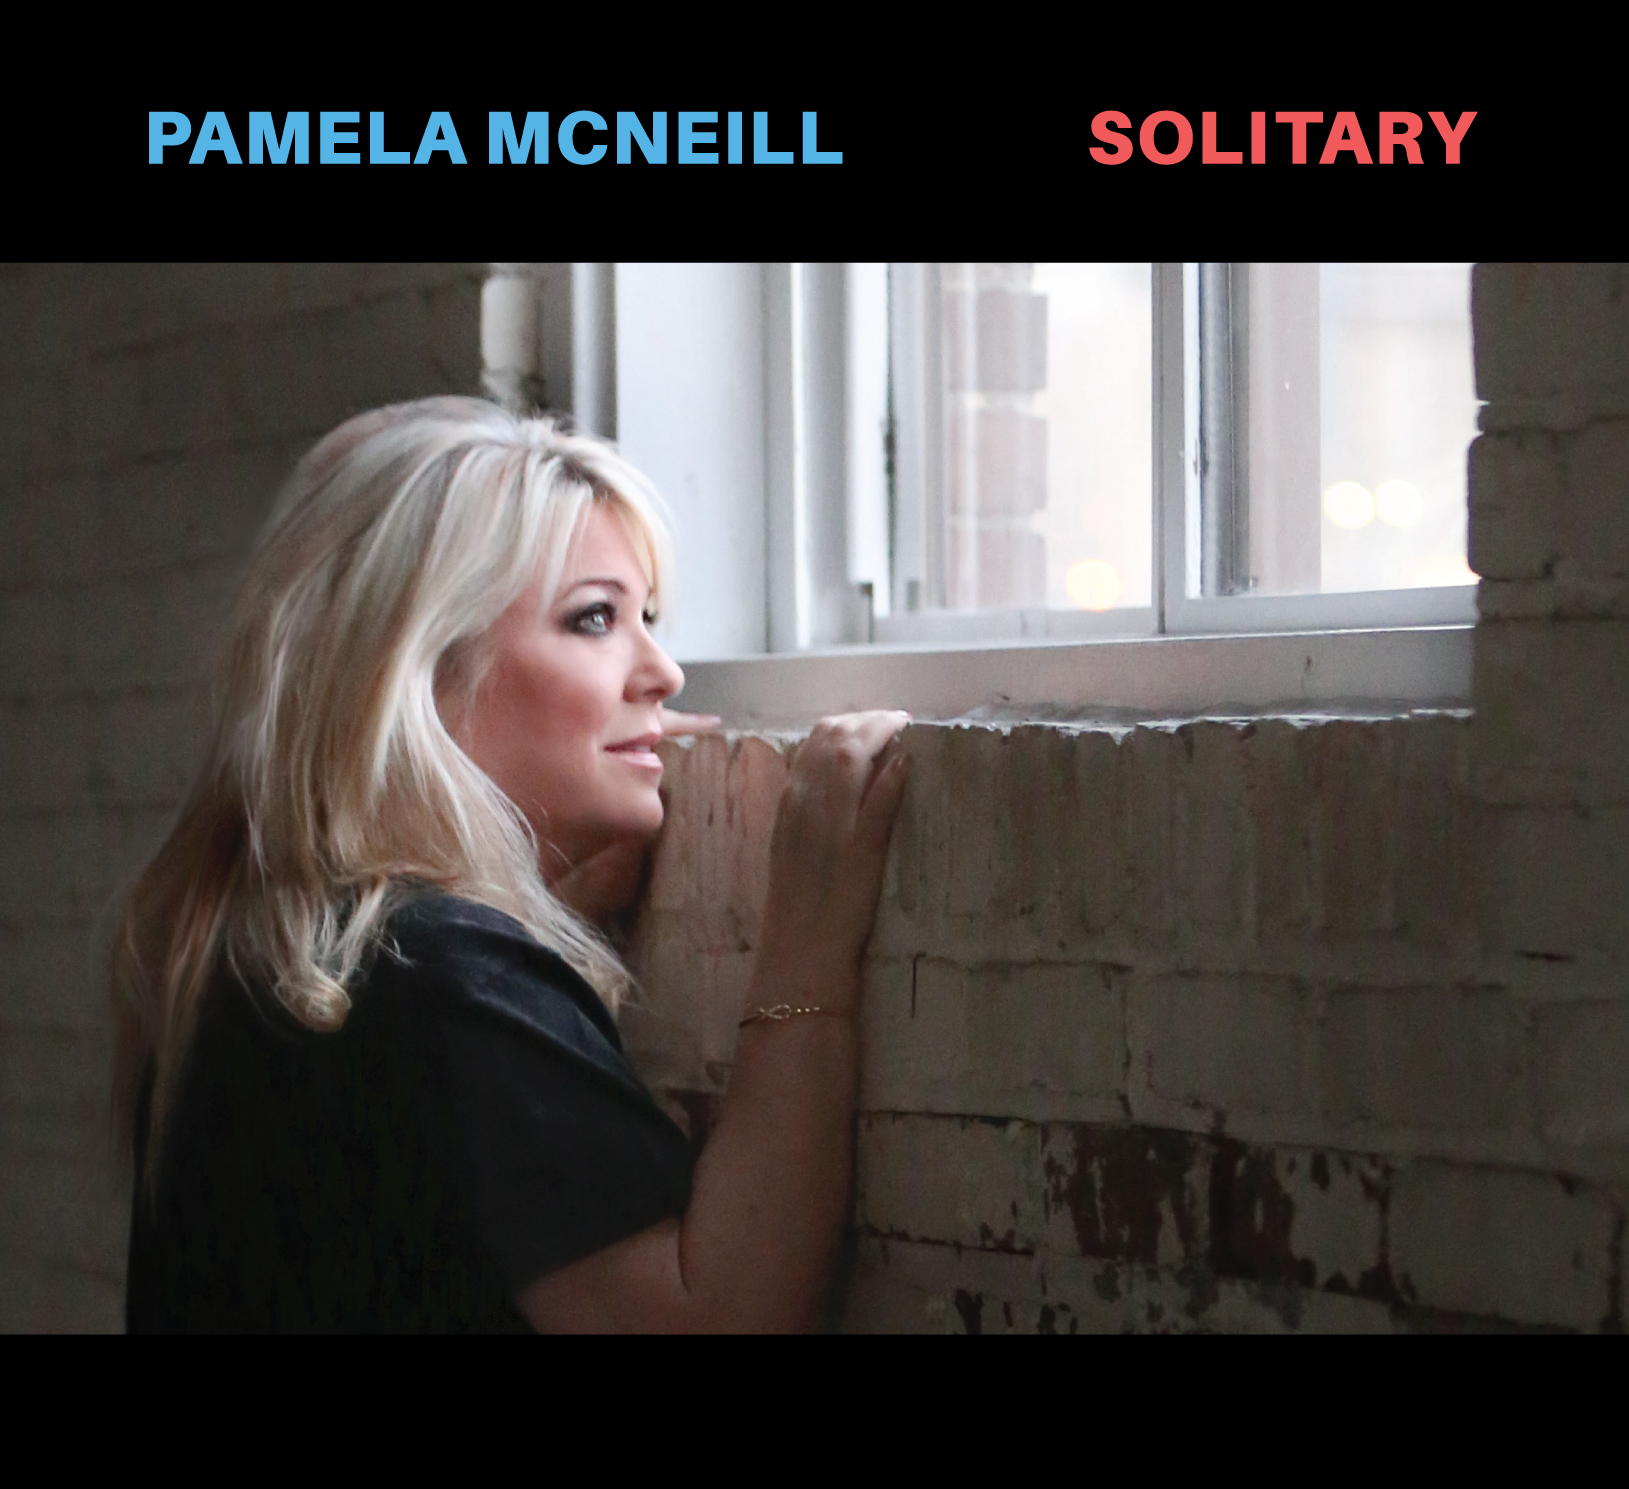 PamelaMcNeill-Solitary_CD-Front (1).jpg